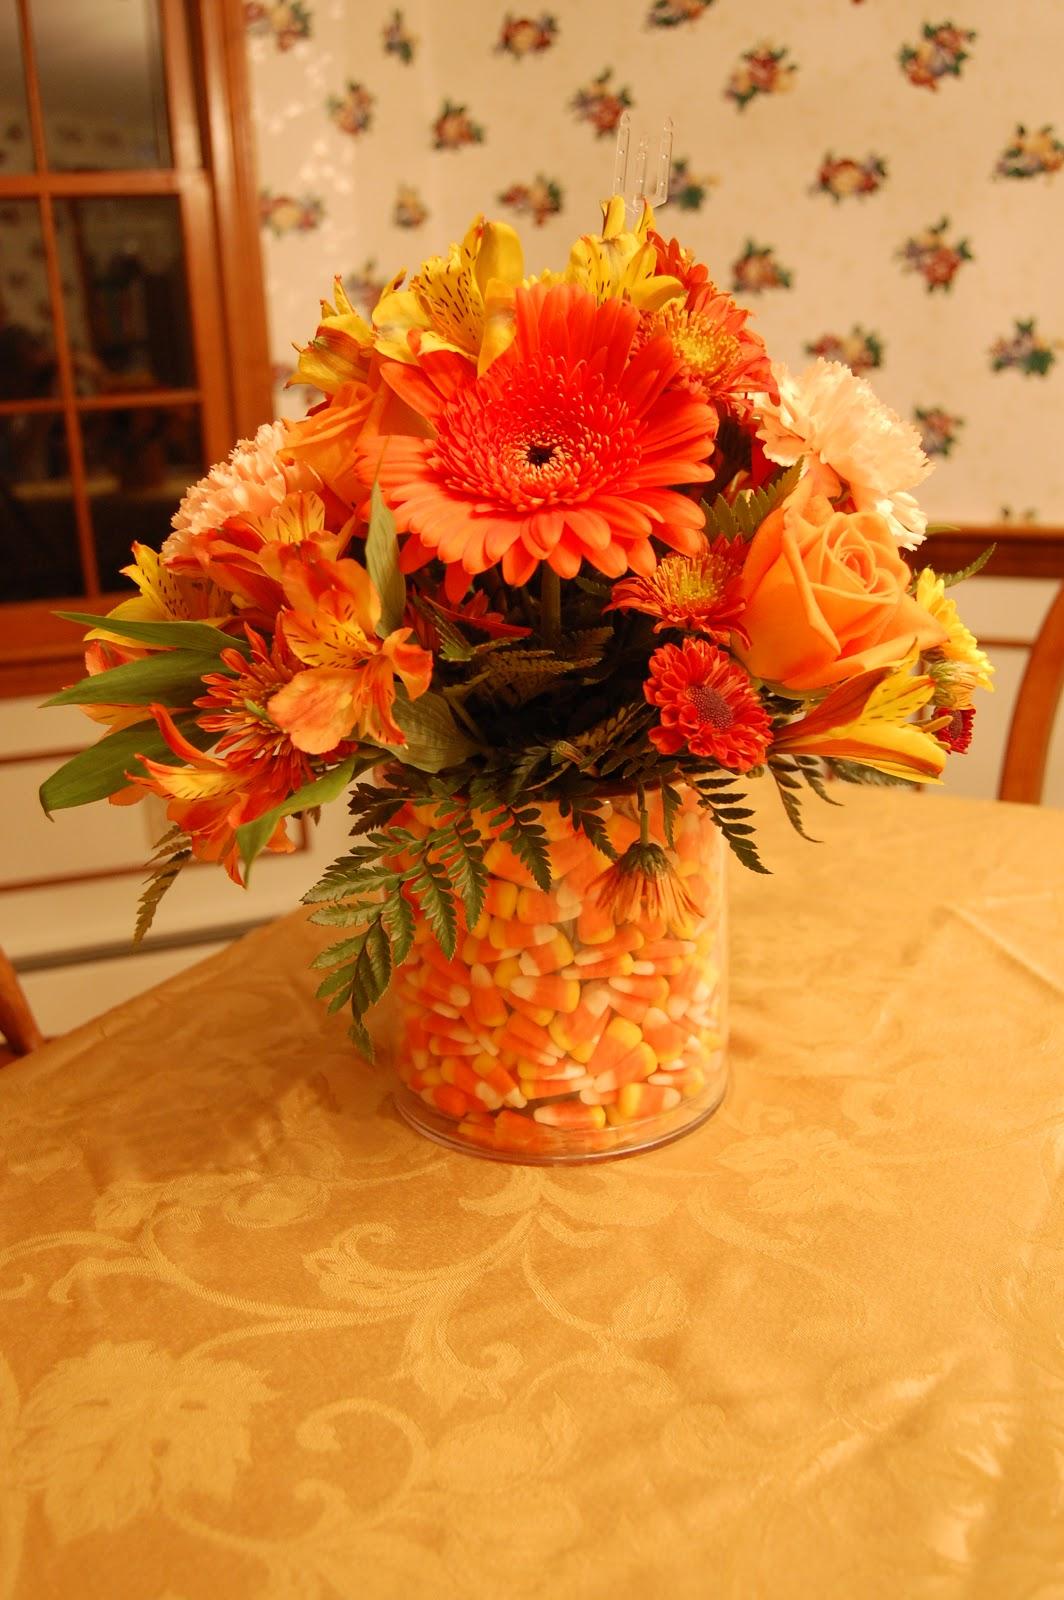 Steves 2 Cents Birthday Flowers